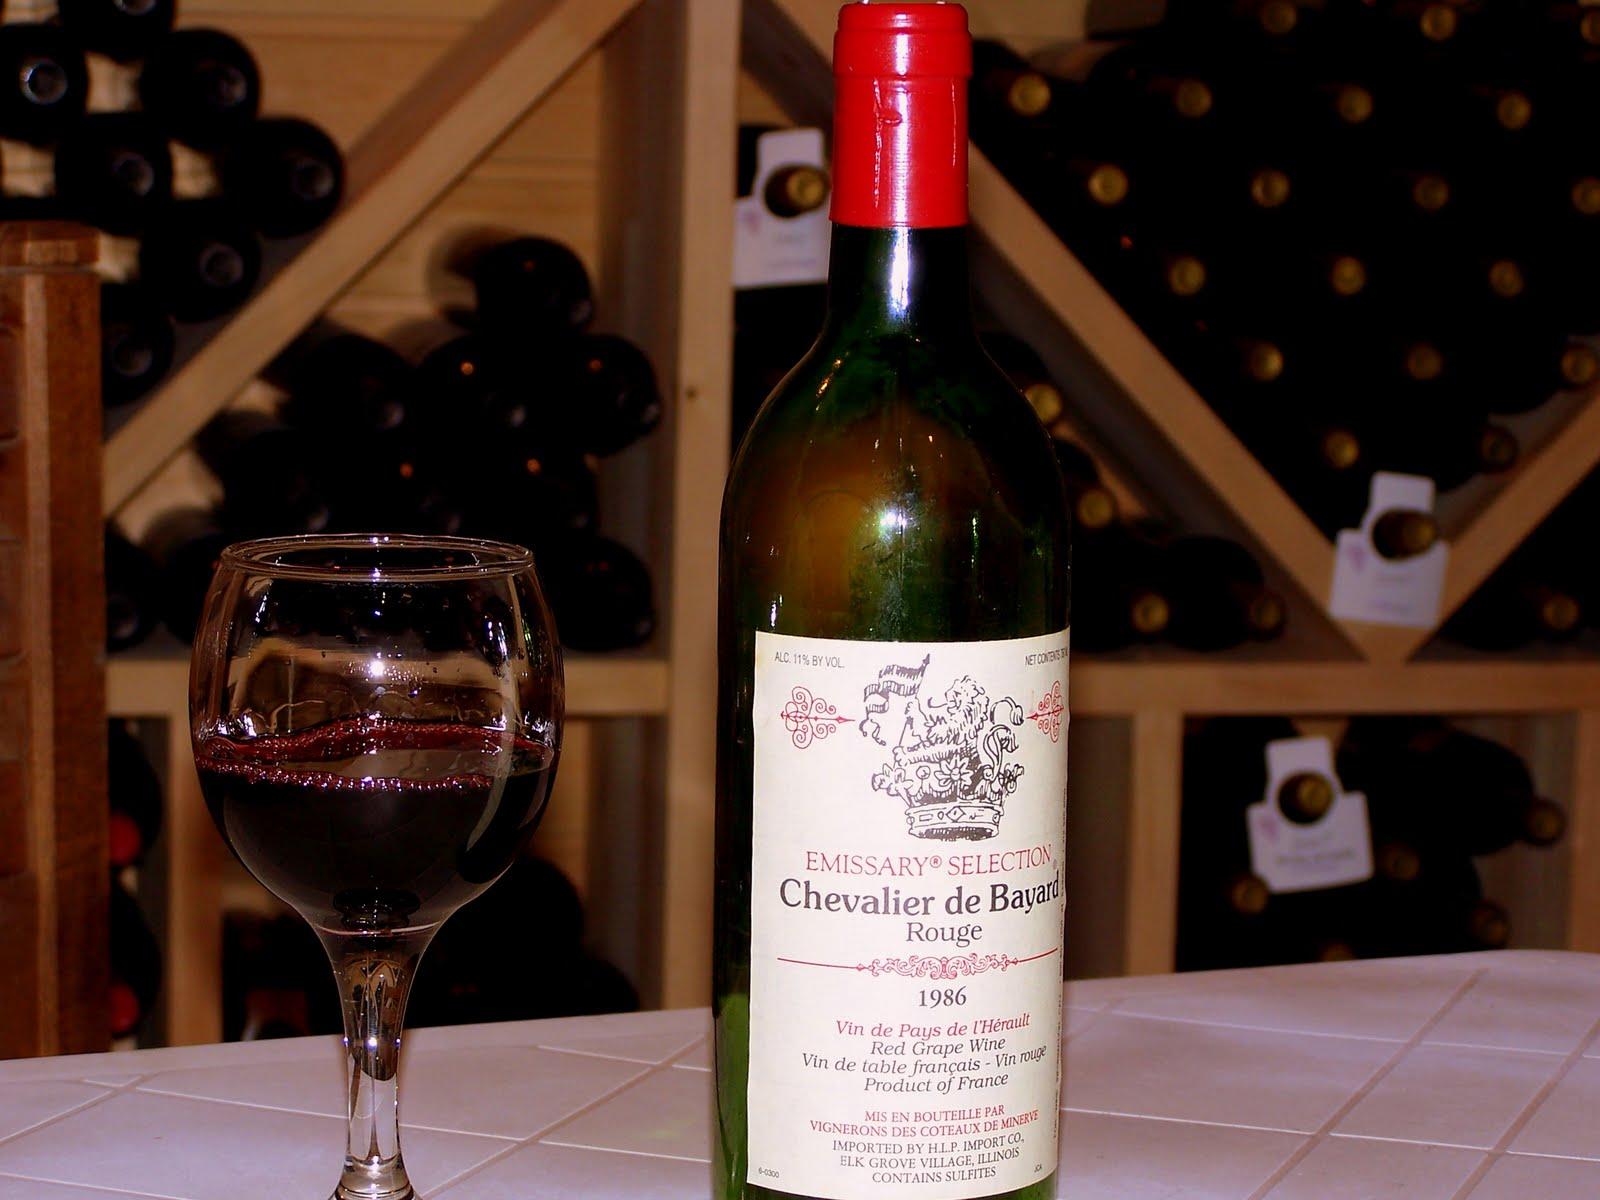 The Wine Cellar: 1986 Chevalier De Bayard, Emissary Selection